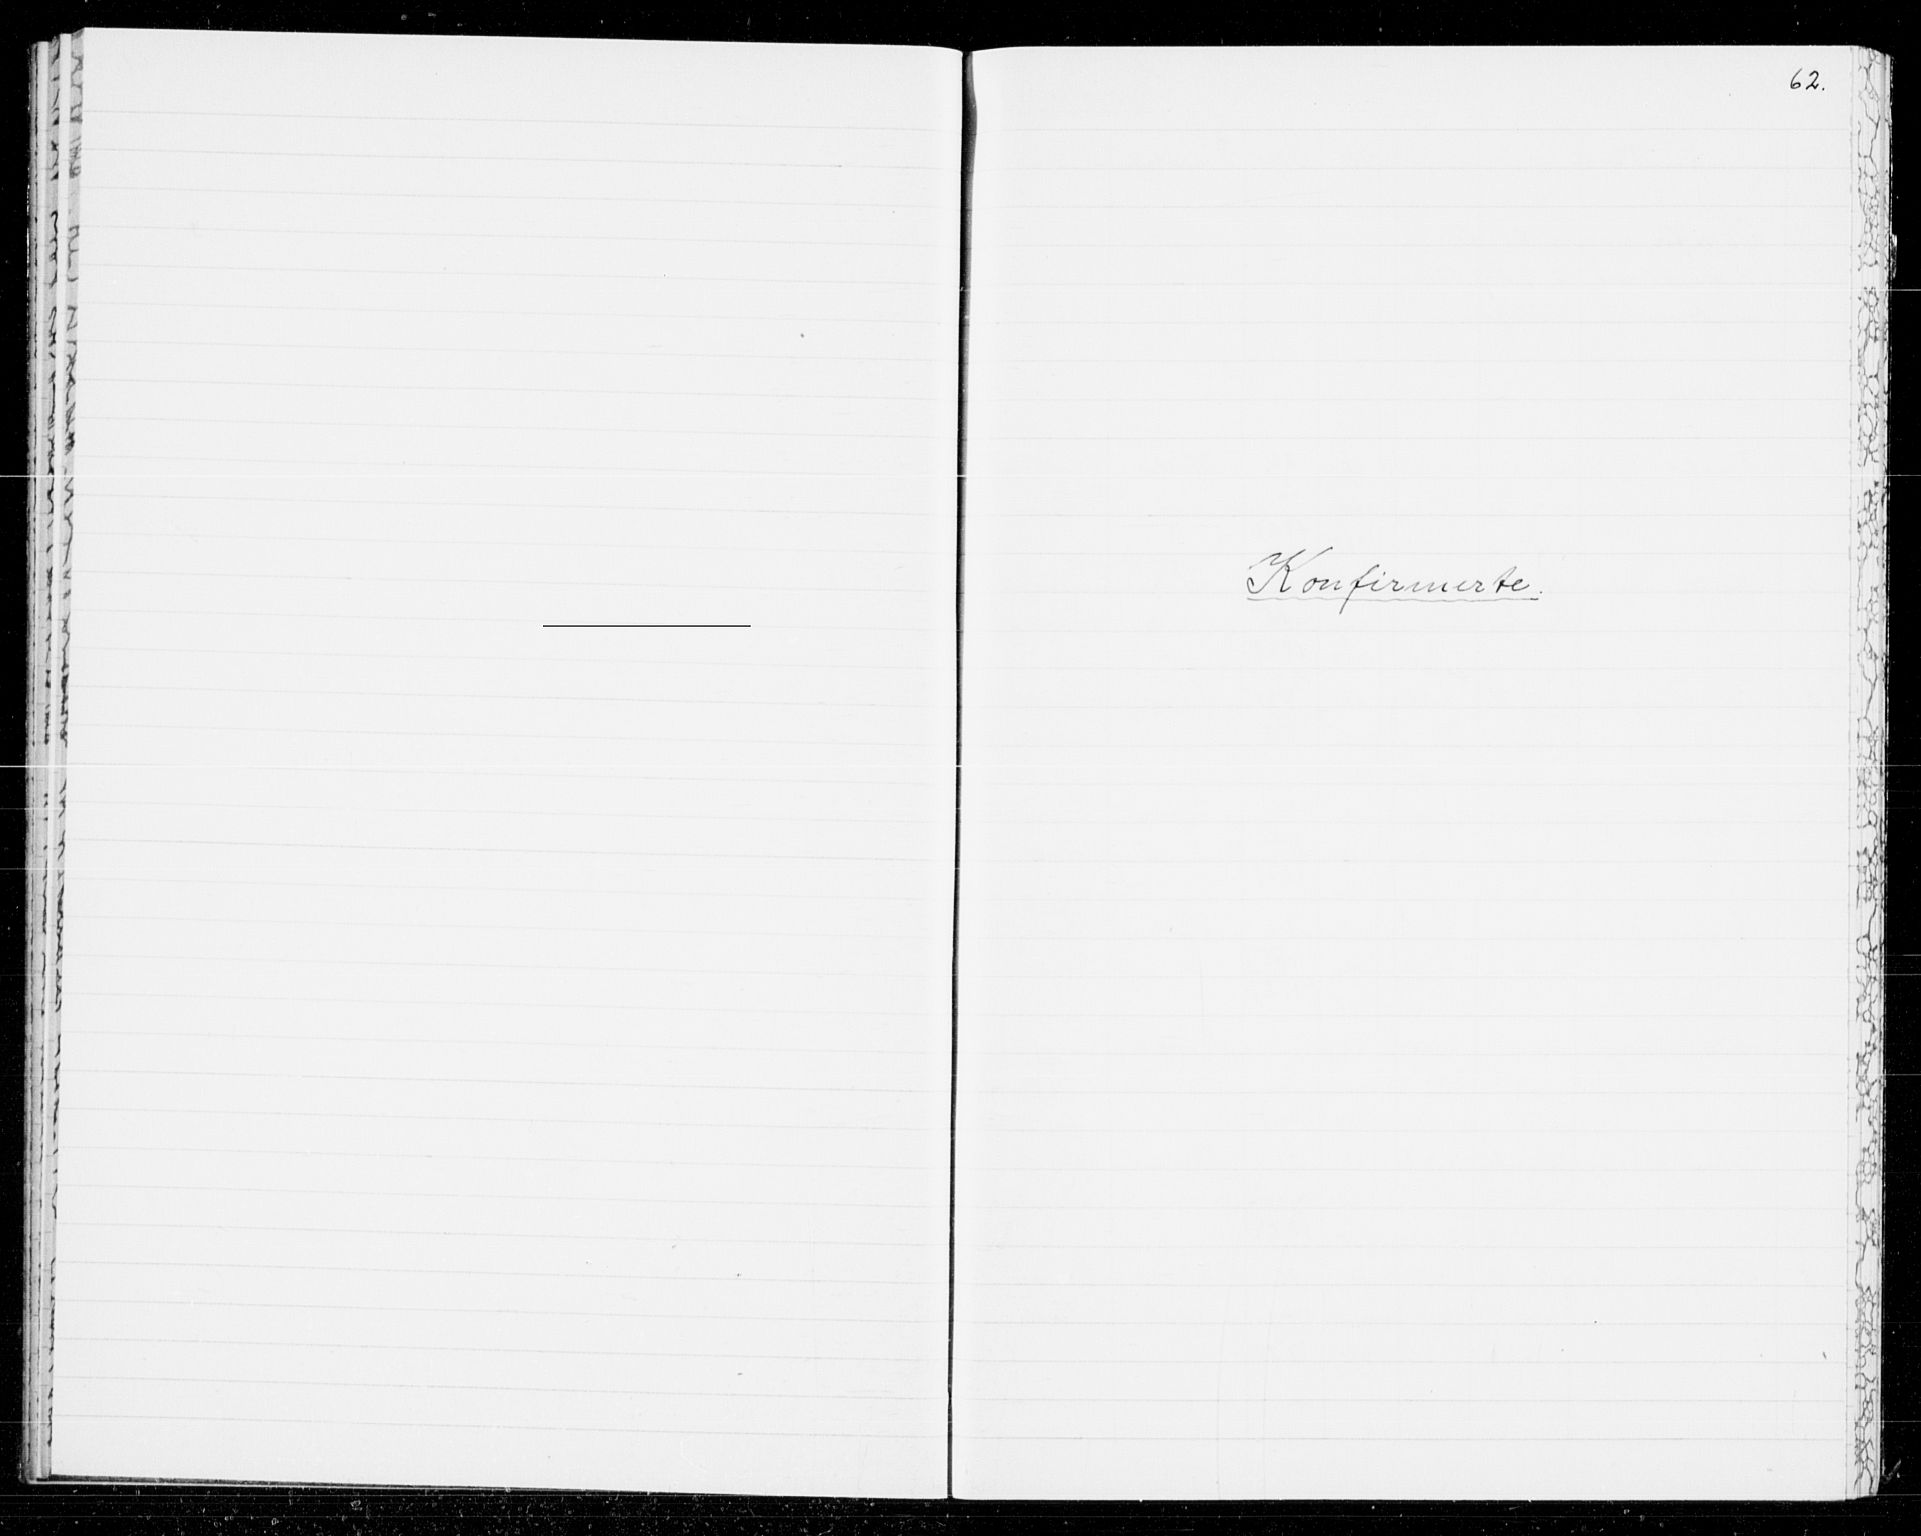 SAKO, Holla kirkebøker, G/Gb/L0004: Klokkerbok nr. II 4, 1942-1943, s. 62